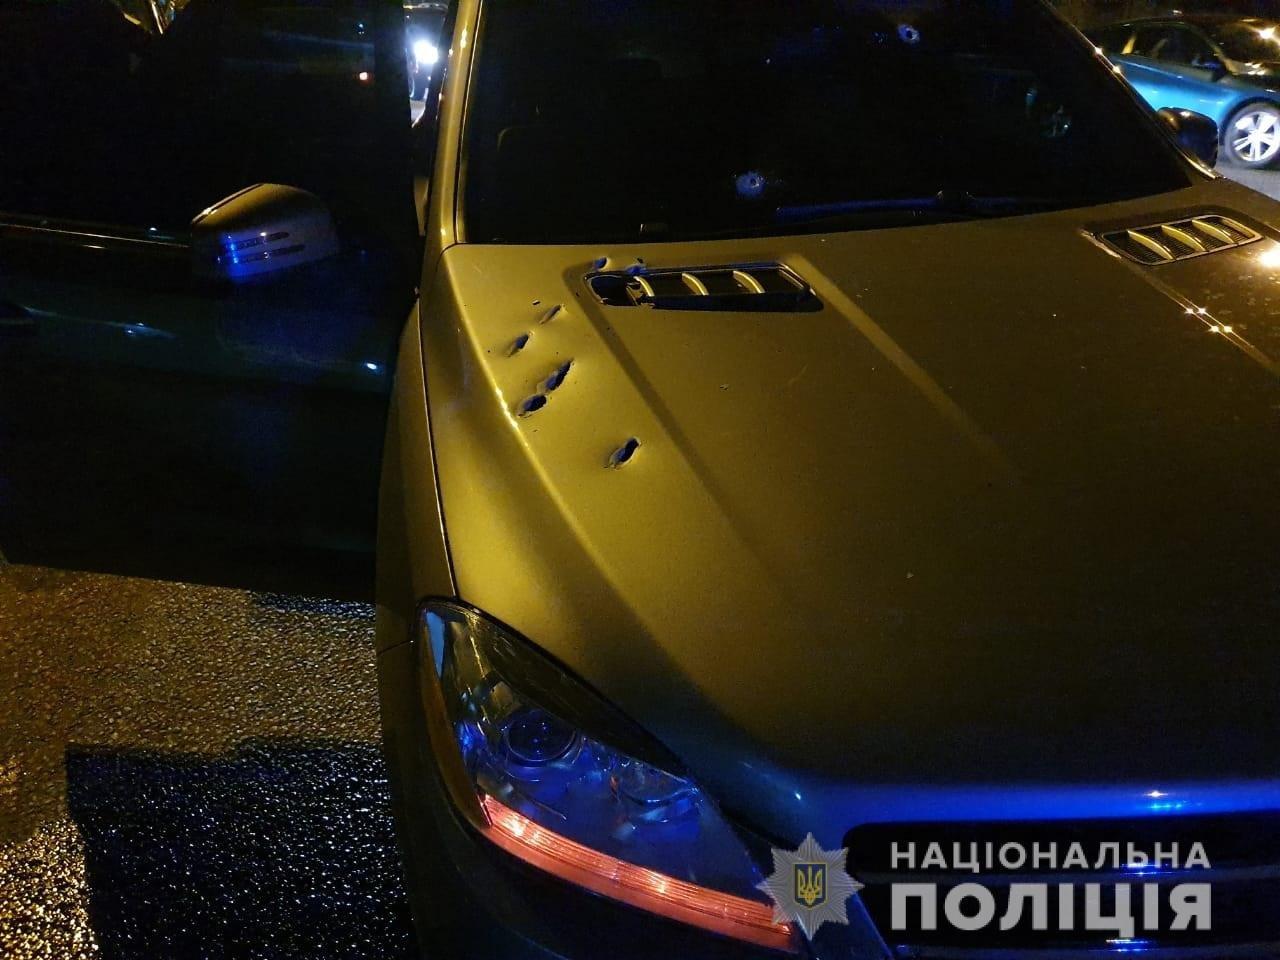 Убийство на Набережной в Днепре: все подробности, - ФОТО, фото-1